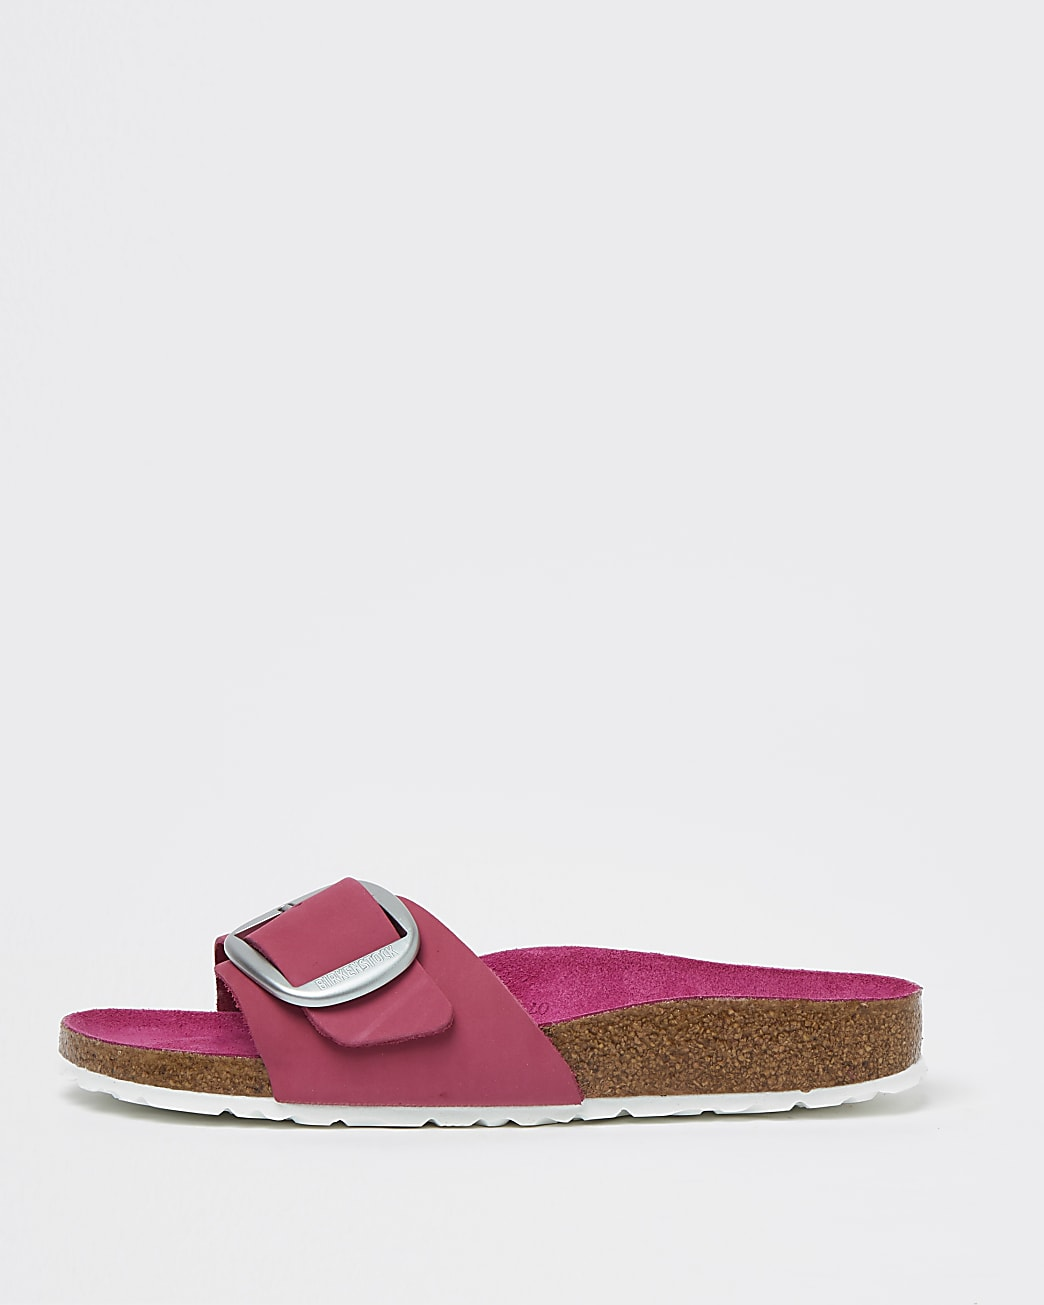 Birkenstock pink large buckle sandals